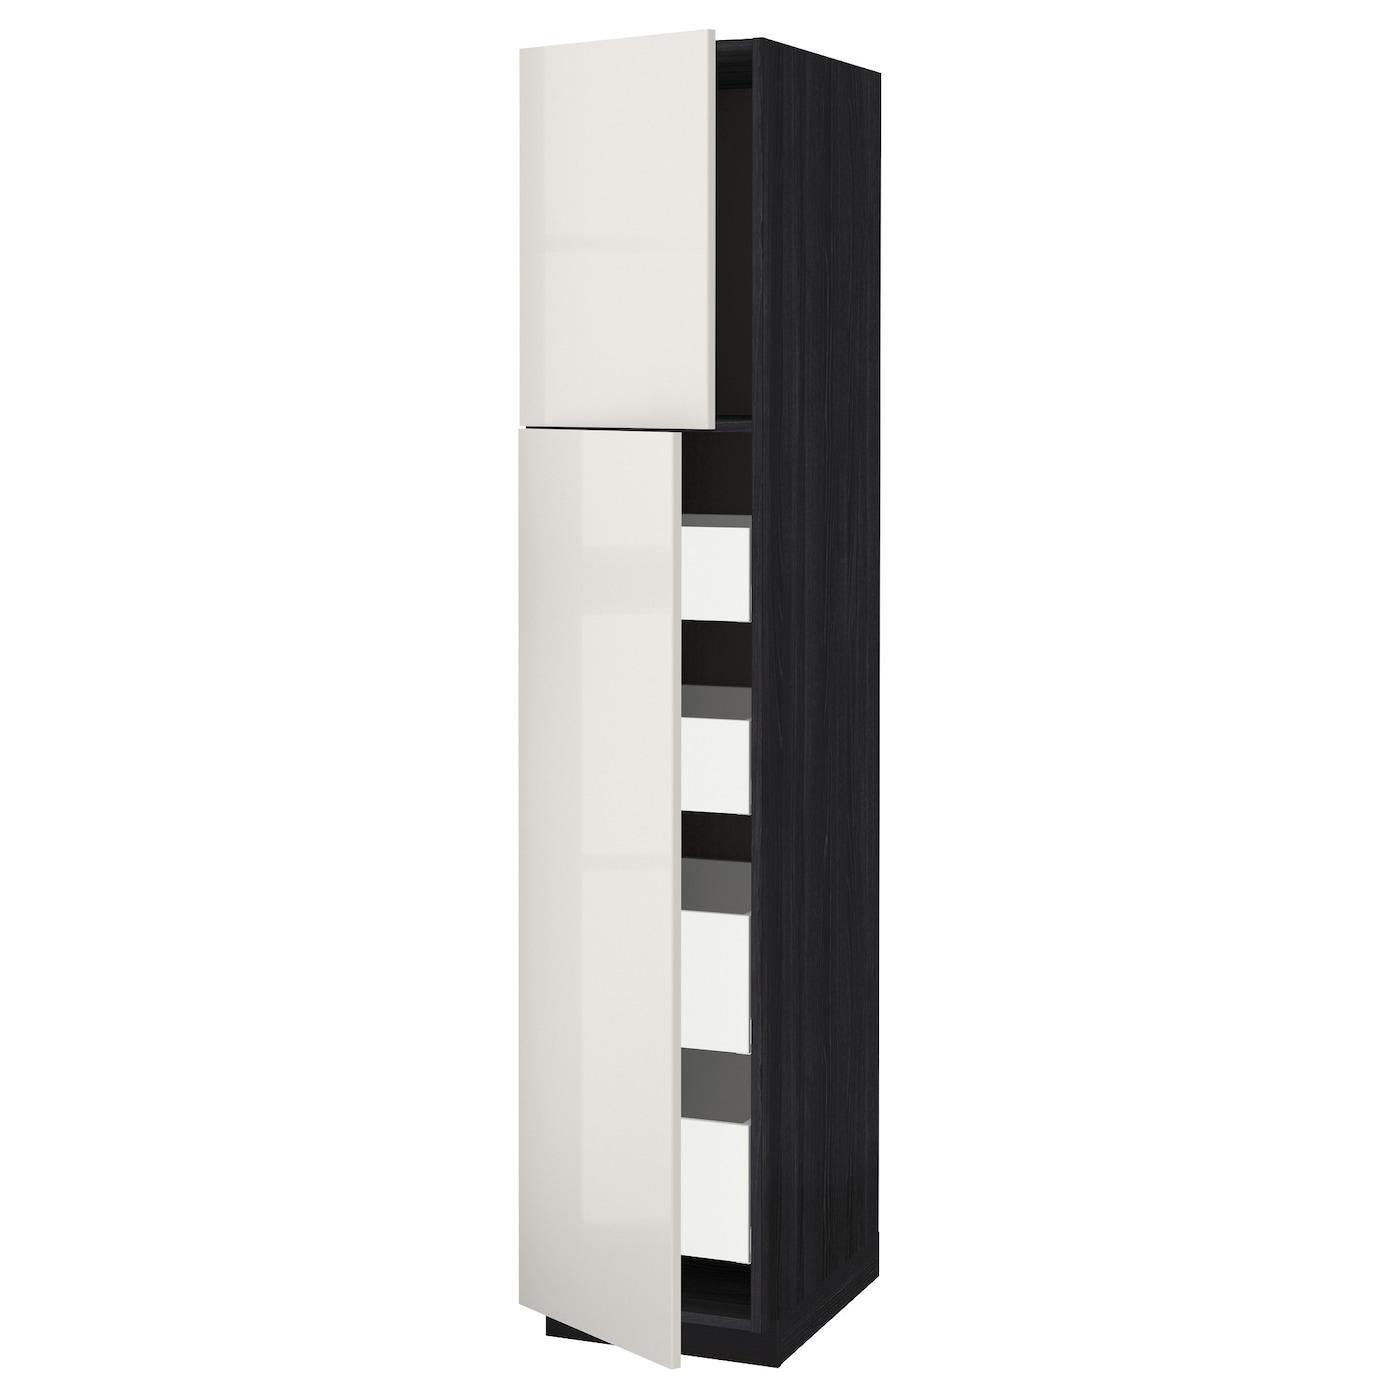 metod maximera armoire 2 portes 4 tiroirs noir ringhult gris clair 40x60x200 cm ikea. Black Bedroom Furniture Sets. Home Design Ideas